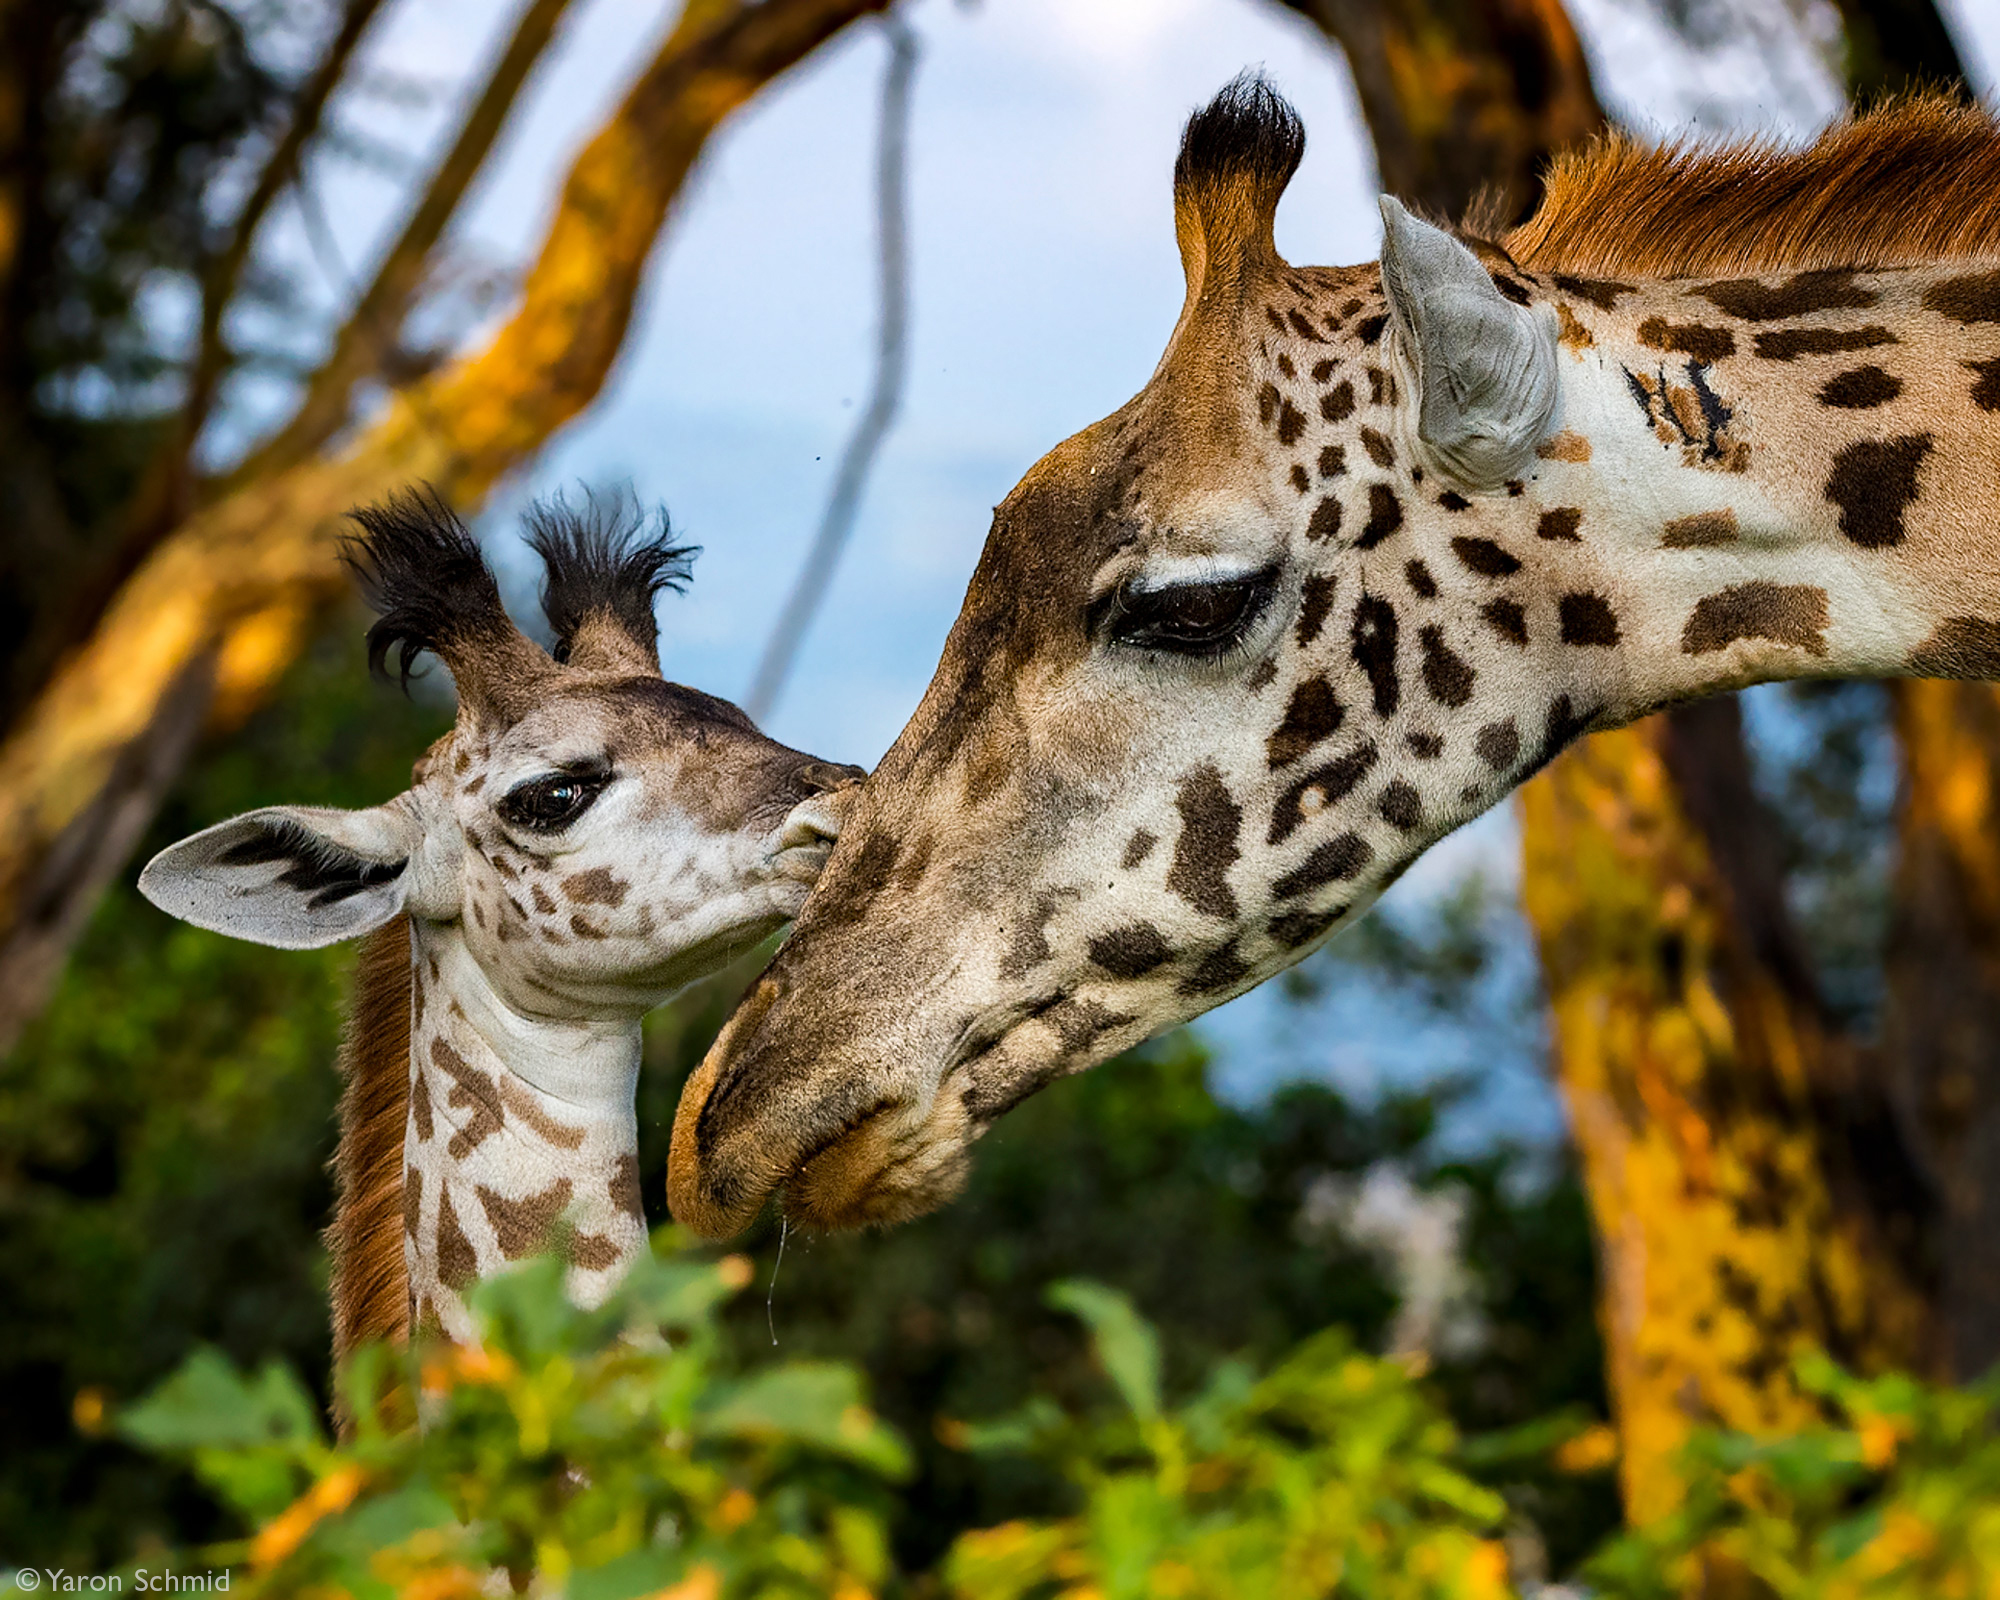 A tender moment between a giraffe and her calf in Naivasha, Kenya